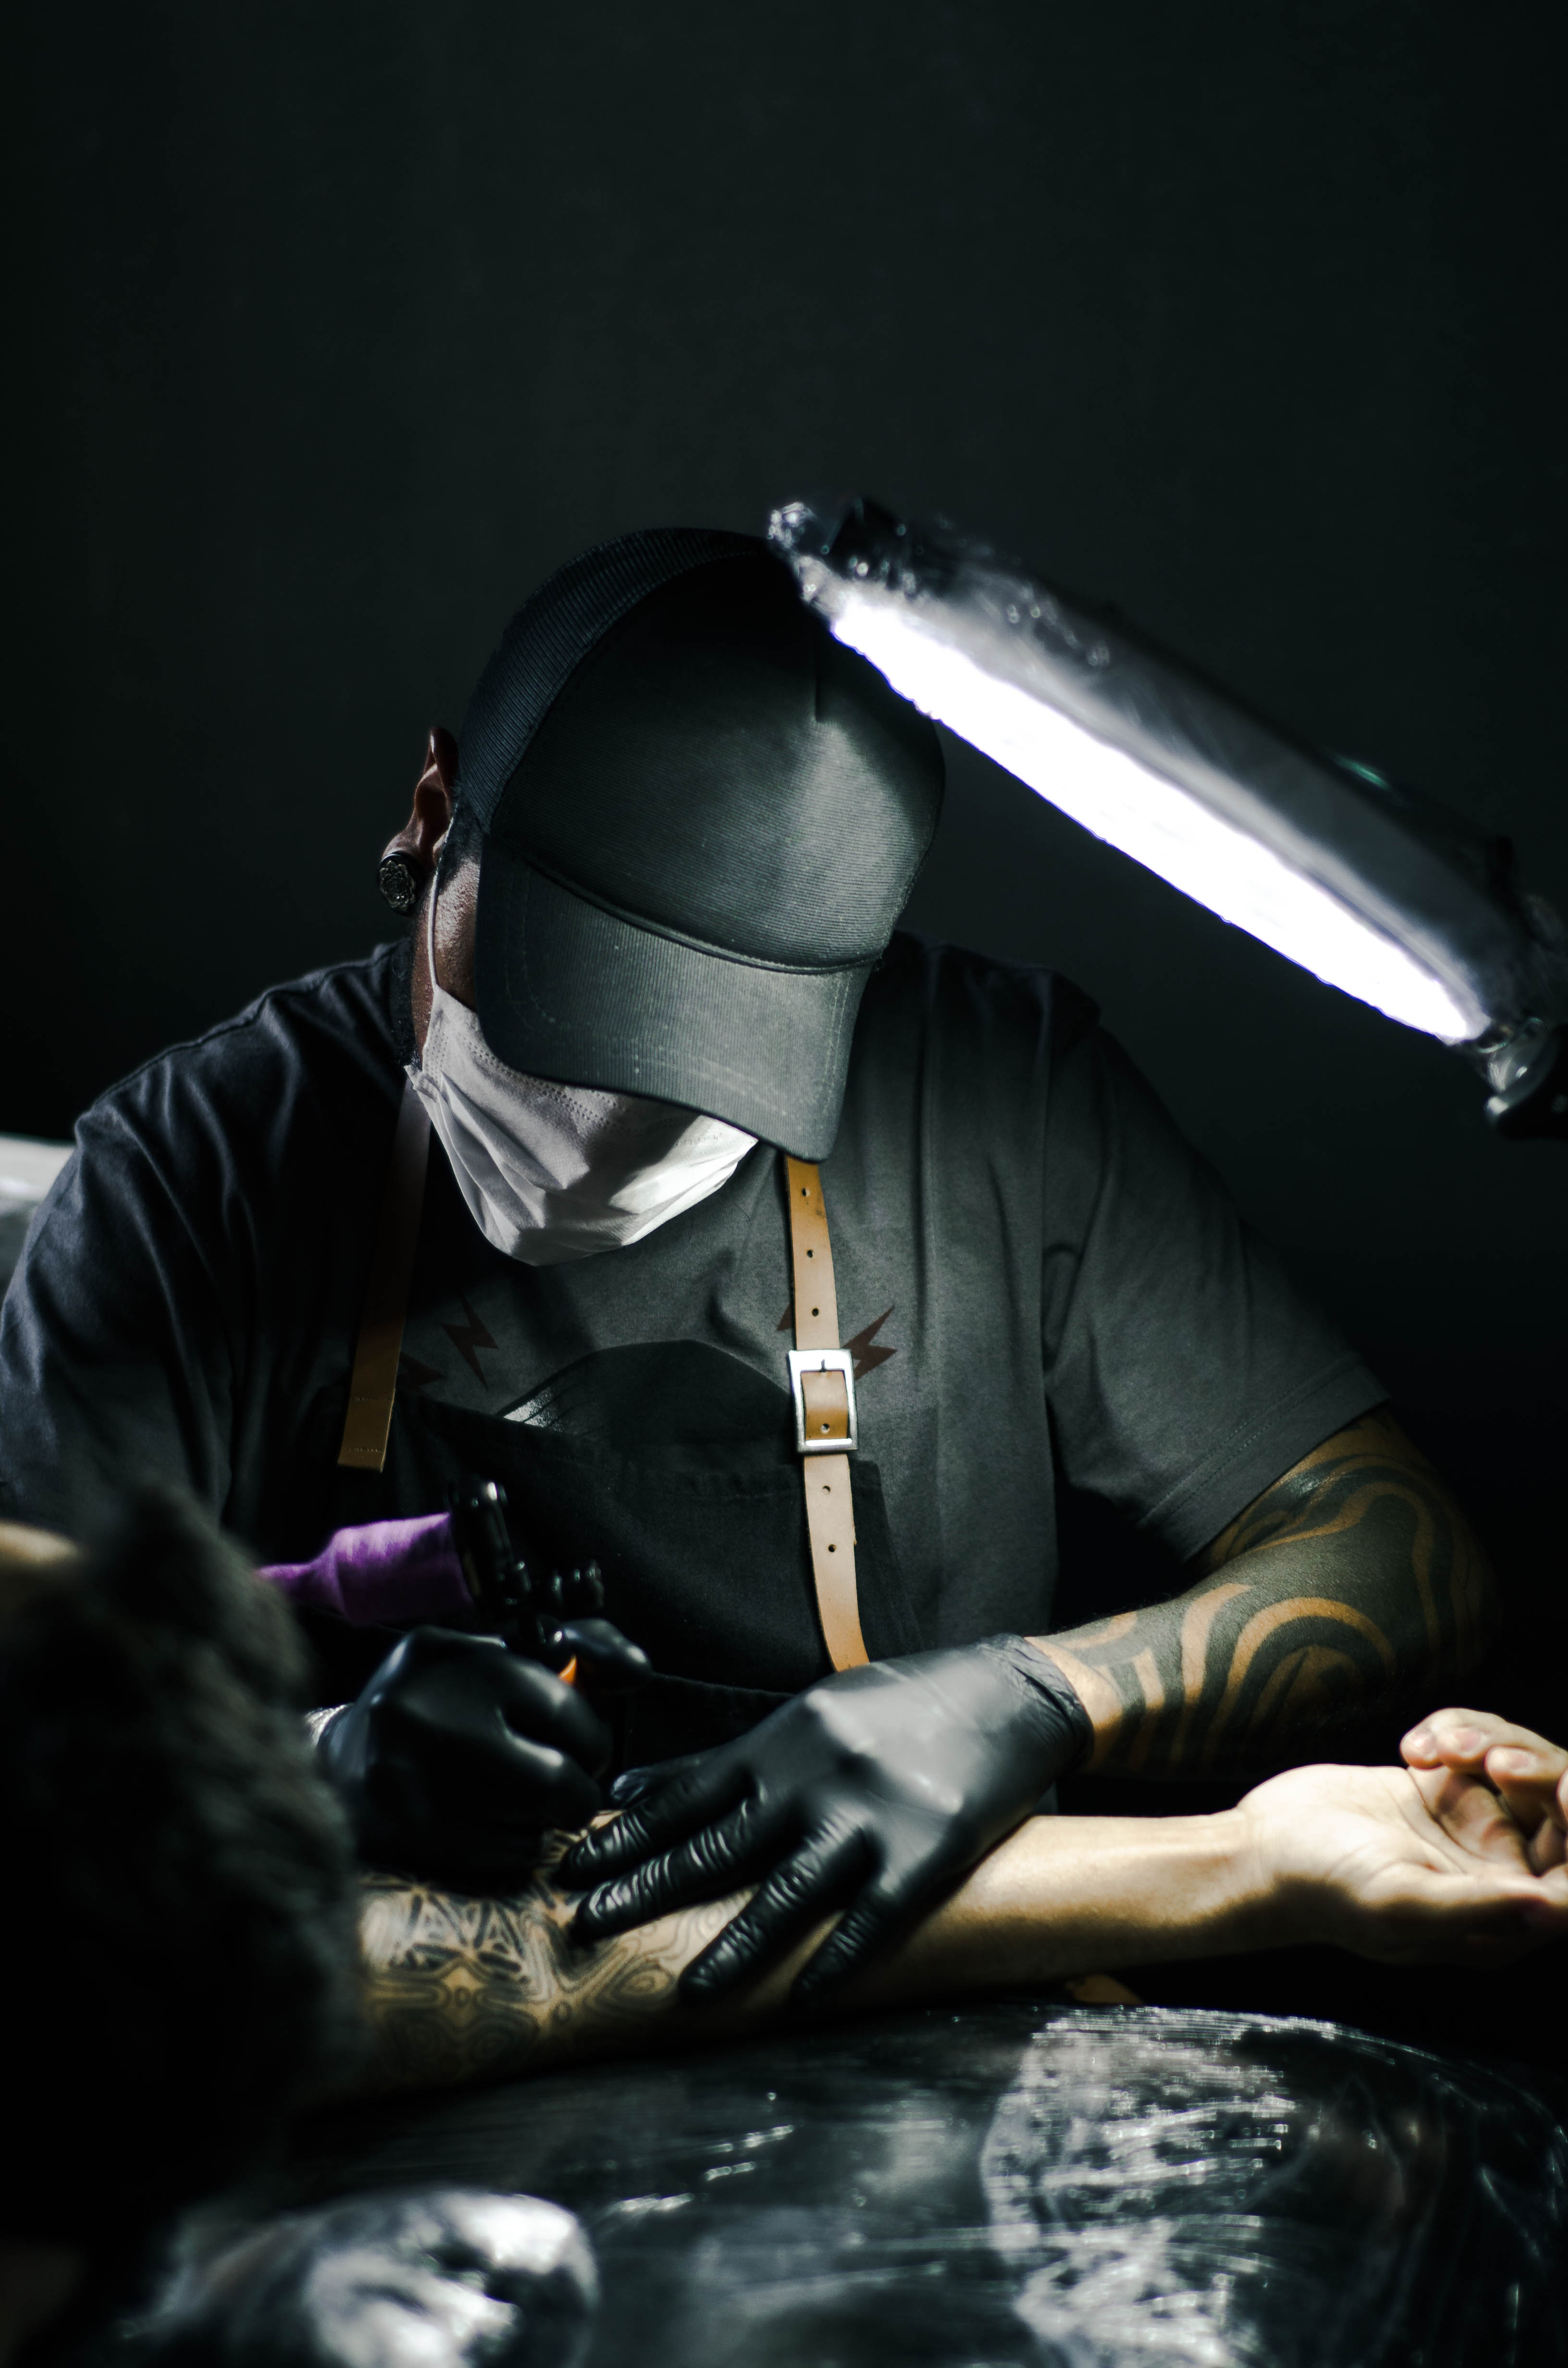 Tattoo Photography: 500+ Great Tattoo Photos · Pexels · Free Stock Photos